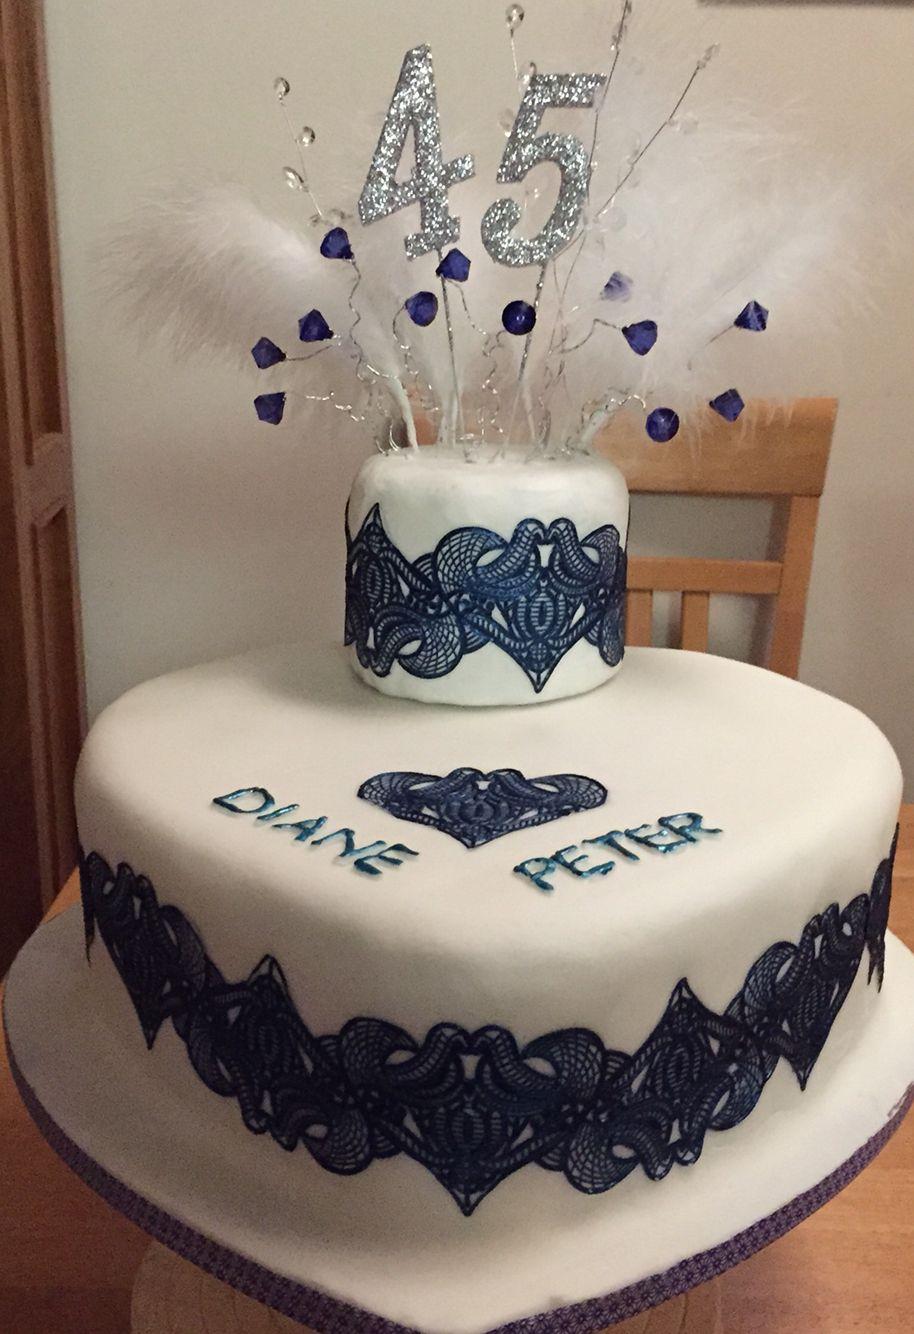 Cake for my mum and dads 45th wedding anniversary, using